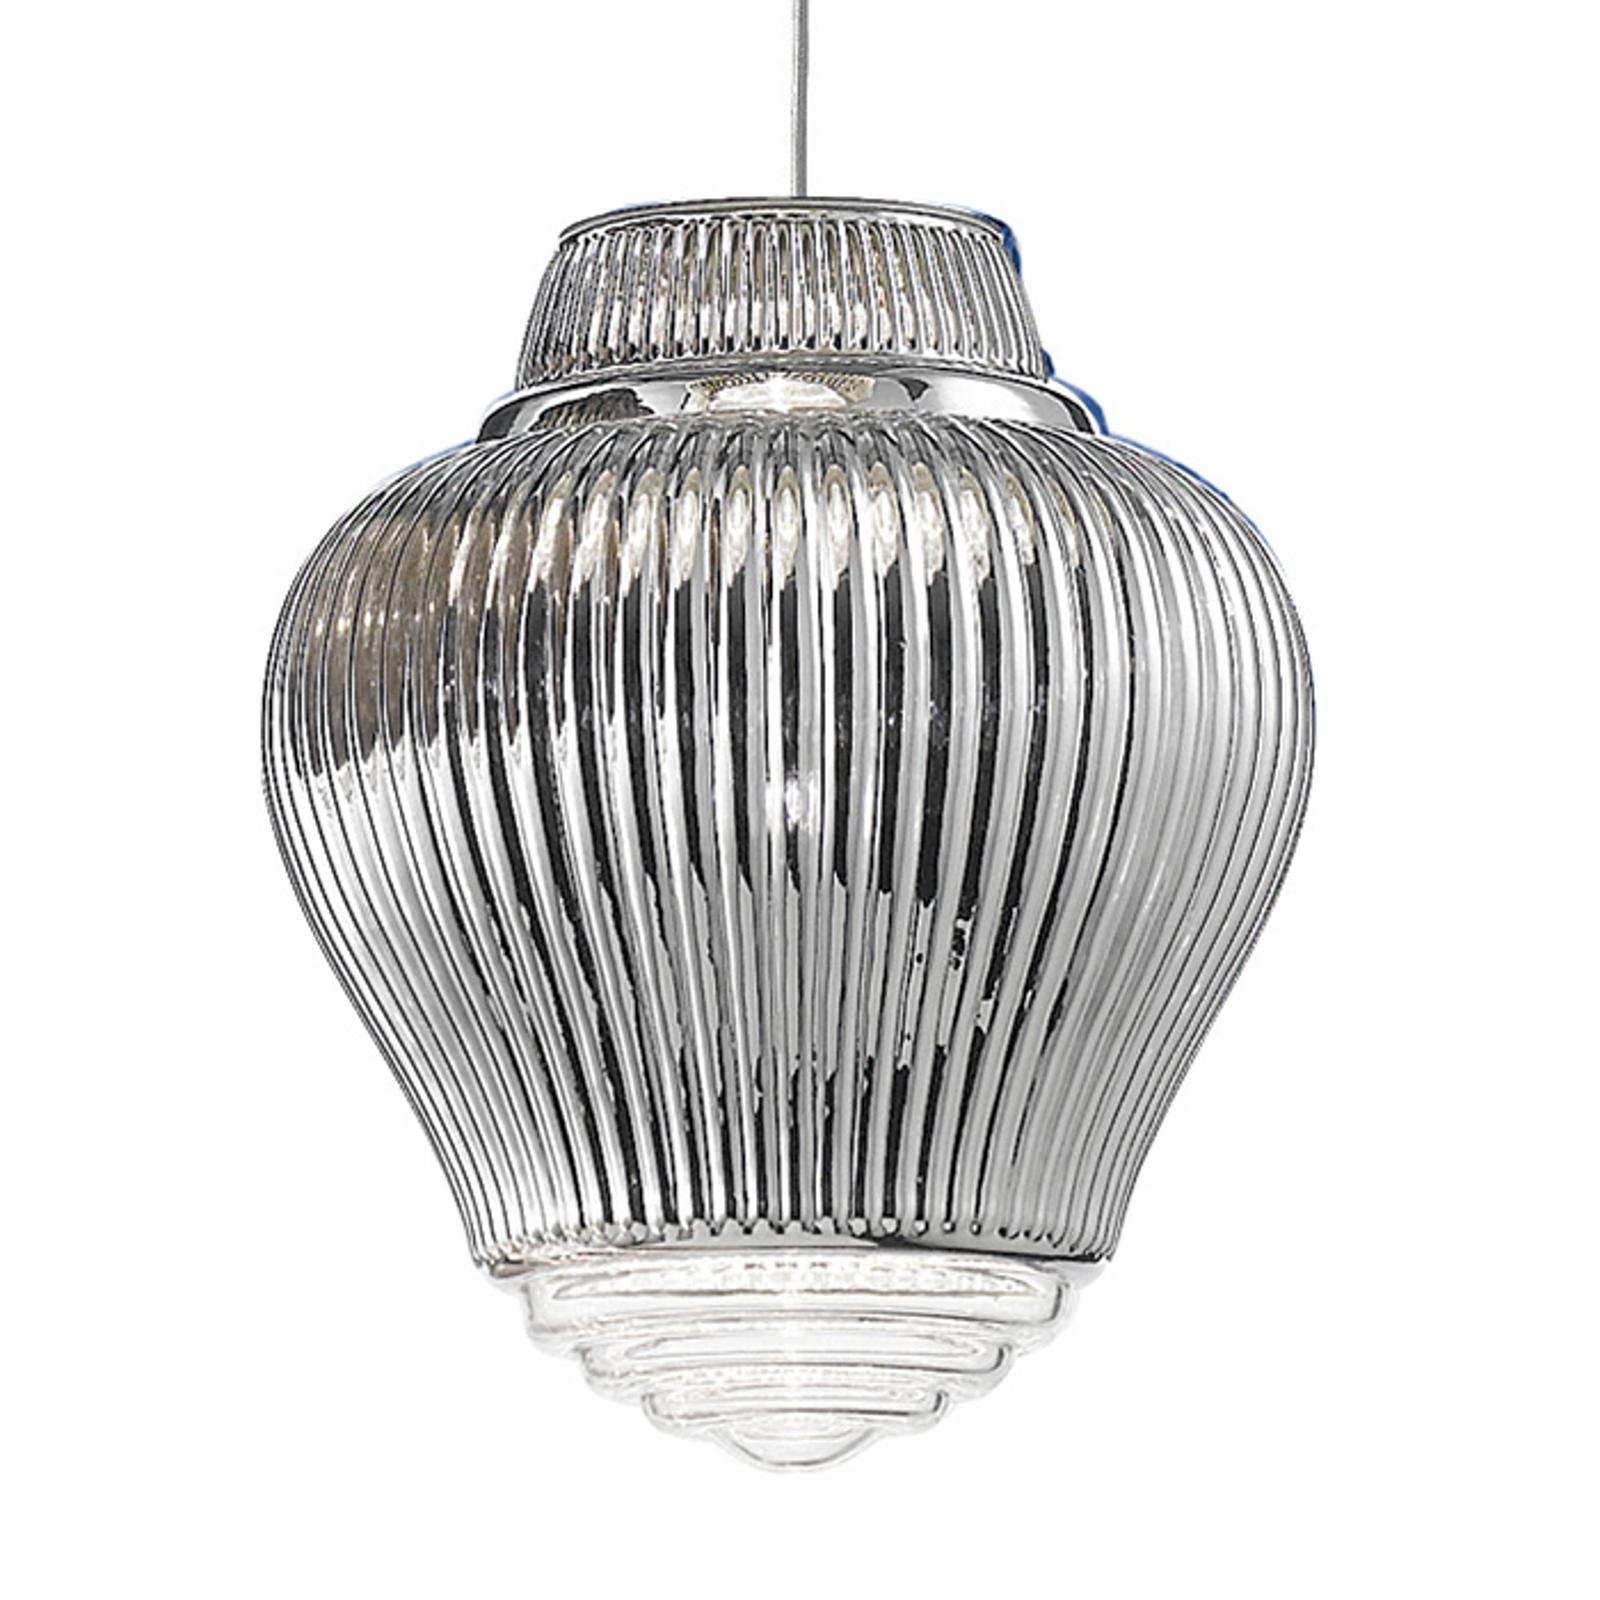 Lampa wisząca Clyde 130 cm srebrna metallic